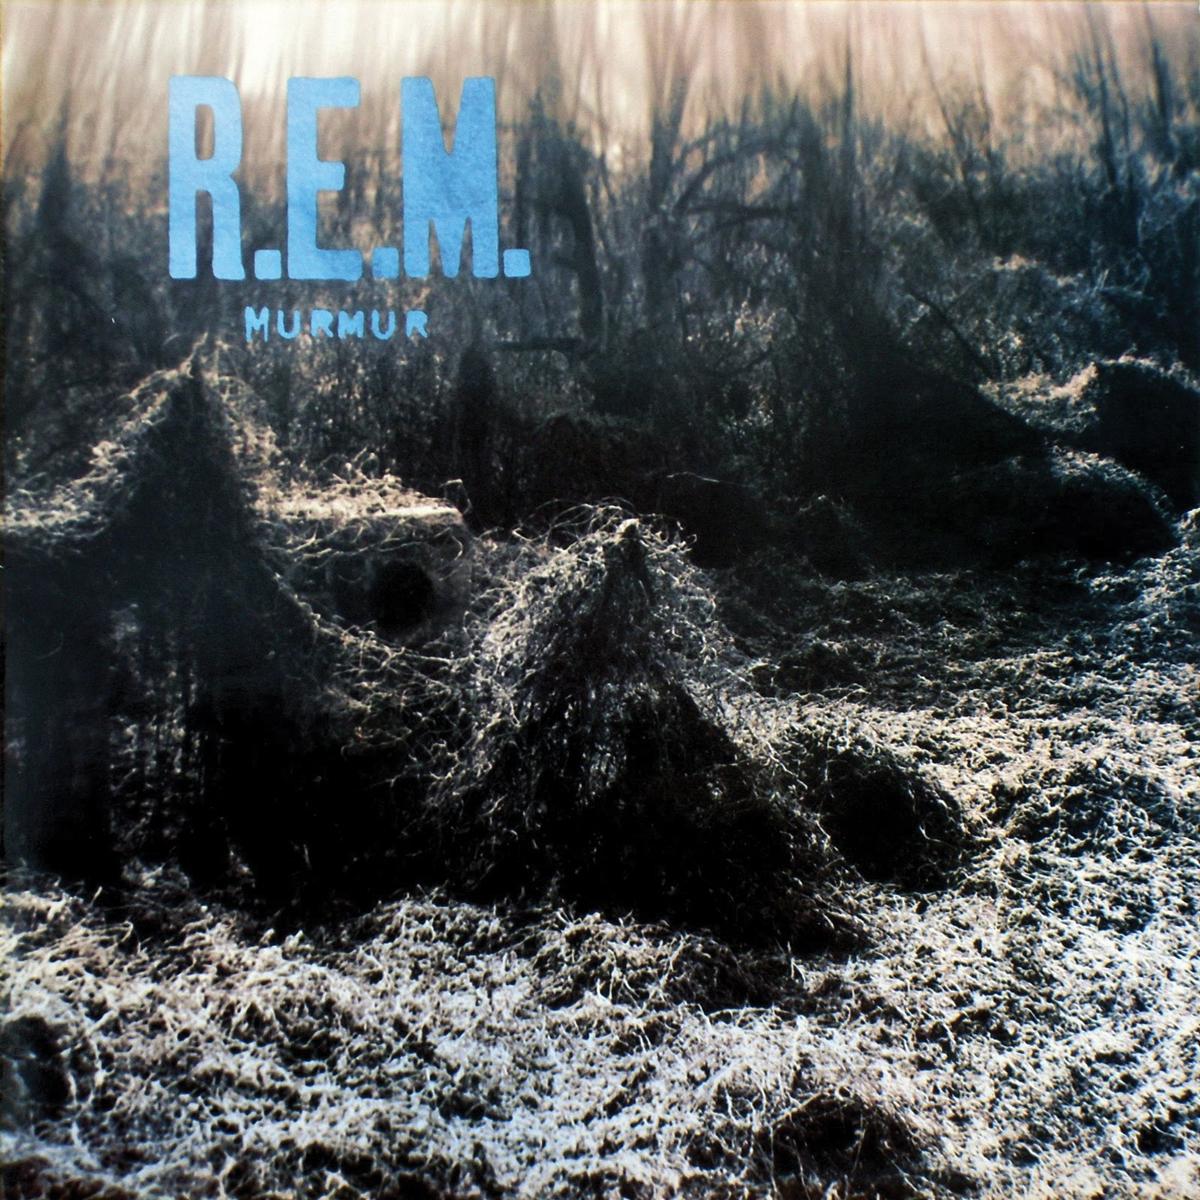 R.E.M. album